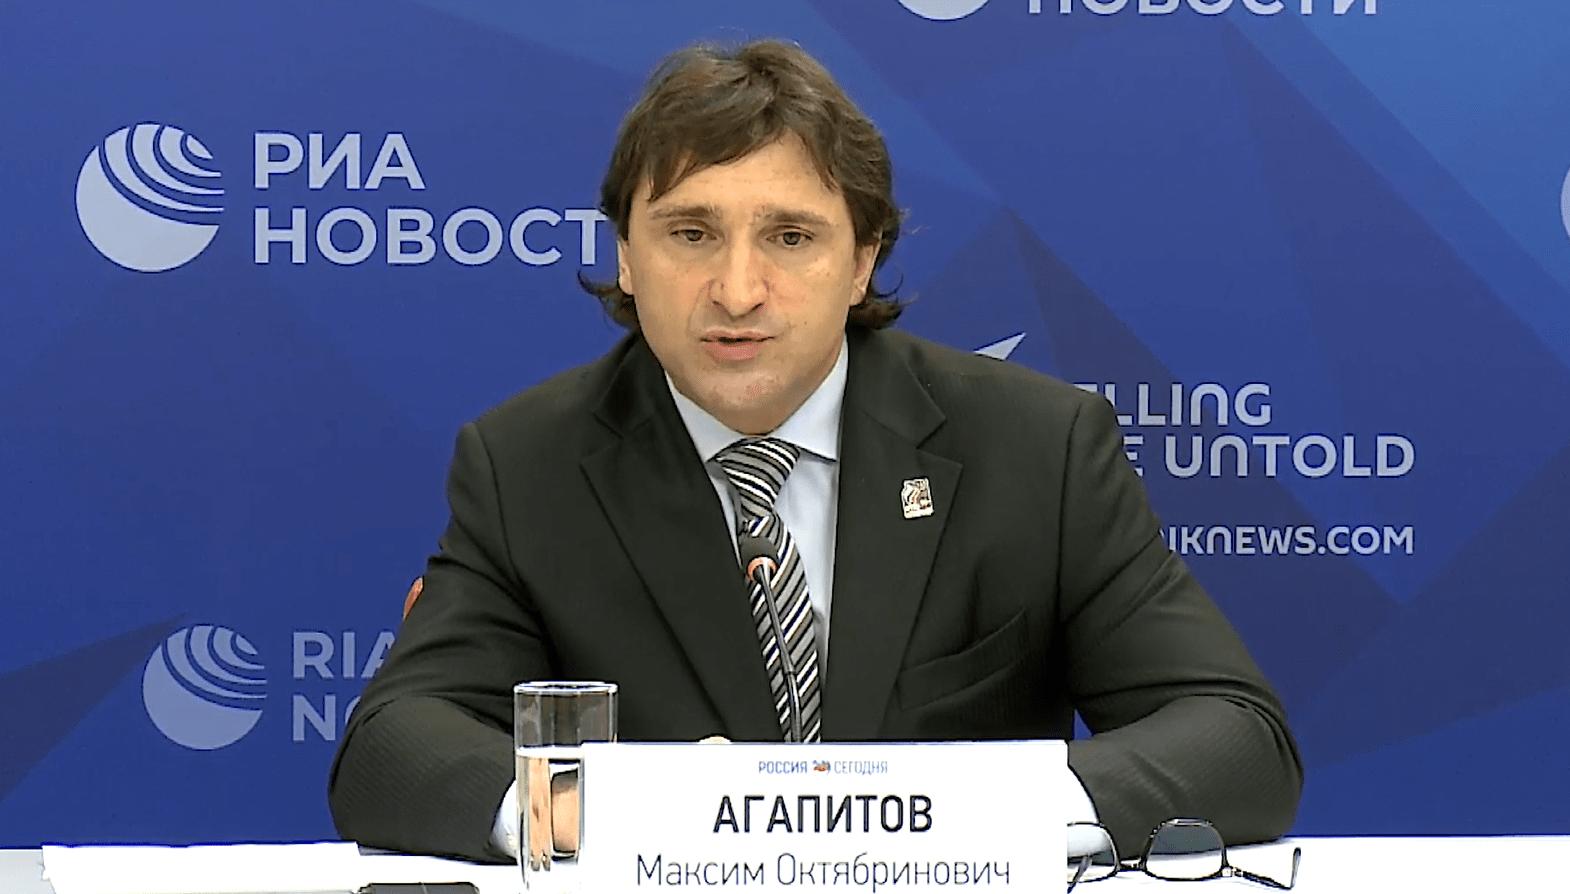 Тяжелая атлетика - время выбора. Пресс-конференция президента ФТАР Максима Агапитова.